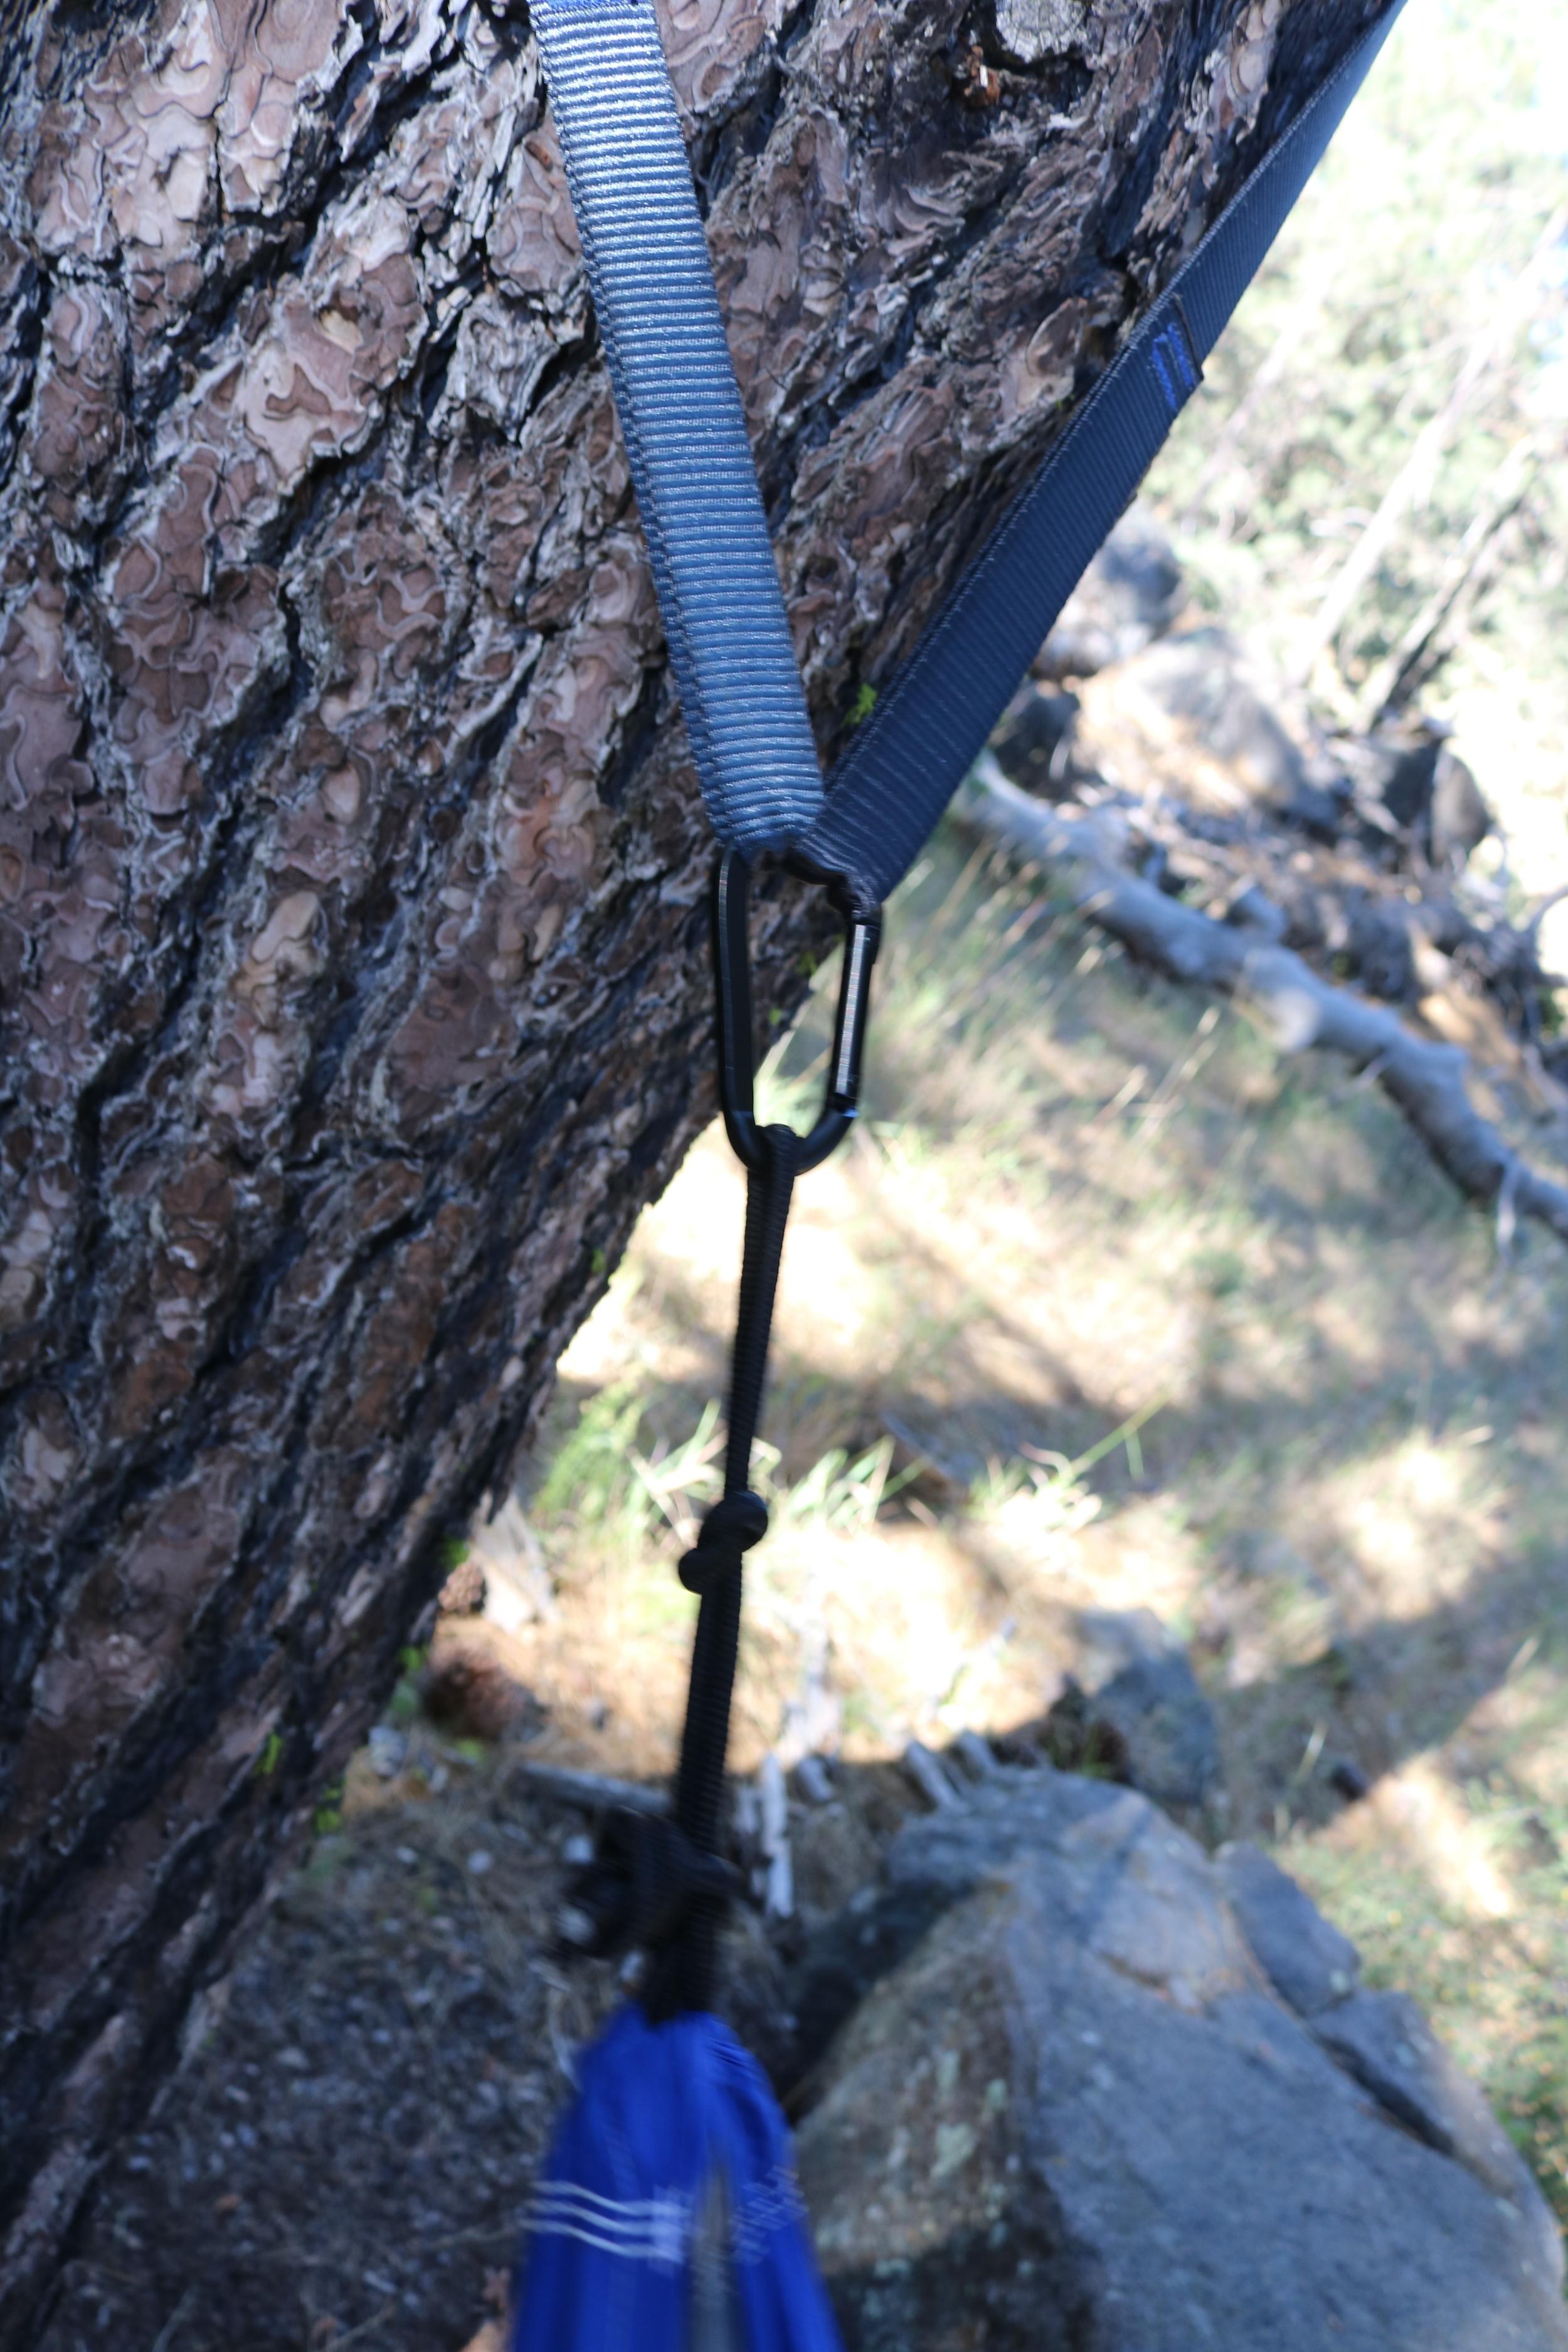 The Serac Tree Strap/Carabiner Combination makes hammock assembly a breeze.